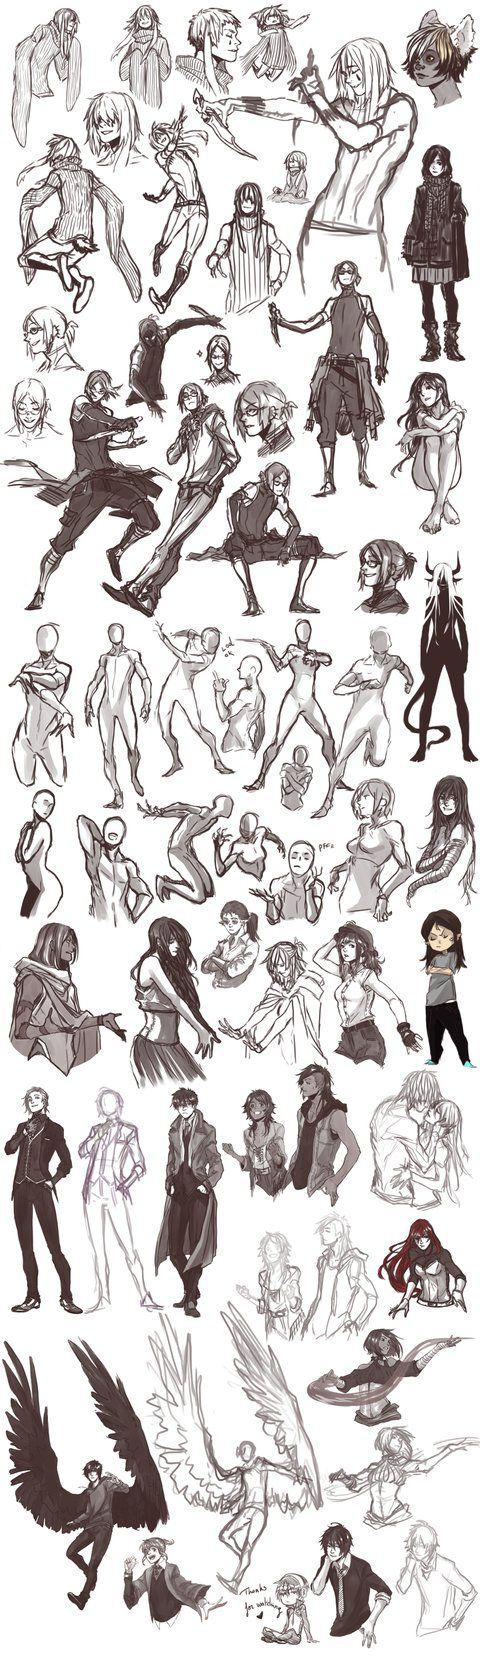 Sketch Dump 28 by Namonn on DeviantArt